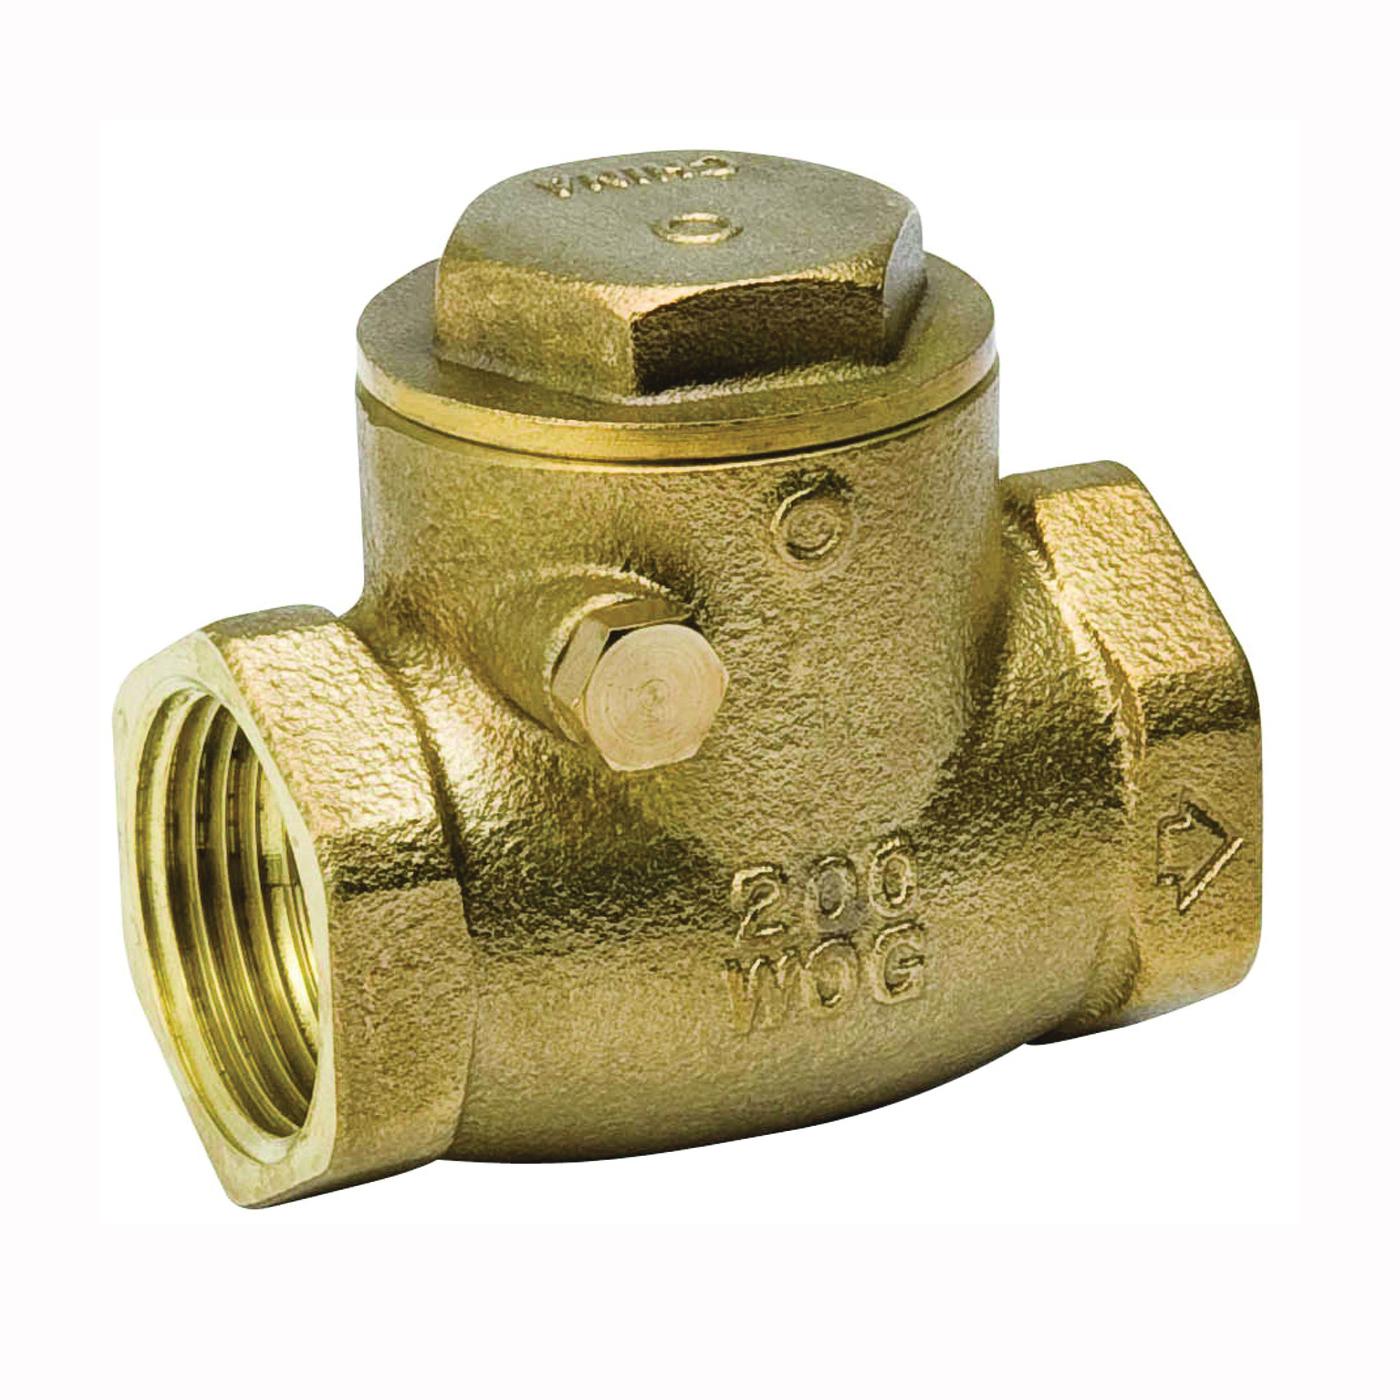 Picture of B & K ProLine 101-008NL Check Valve, 2 in, IPS, 200 psi Pressure, Brass Body